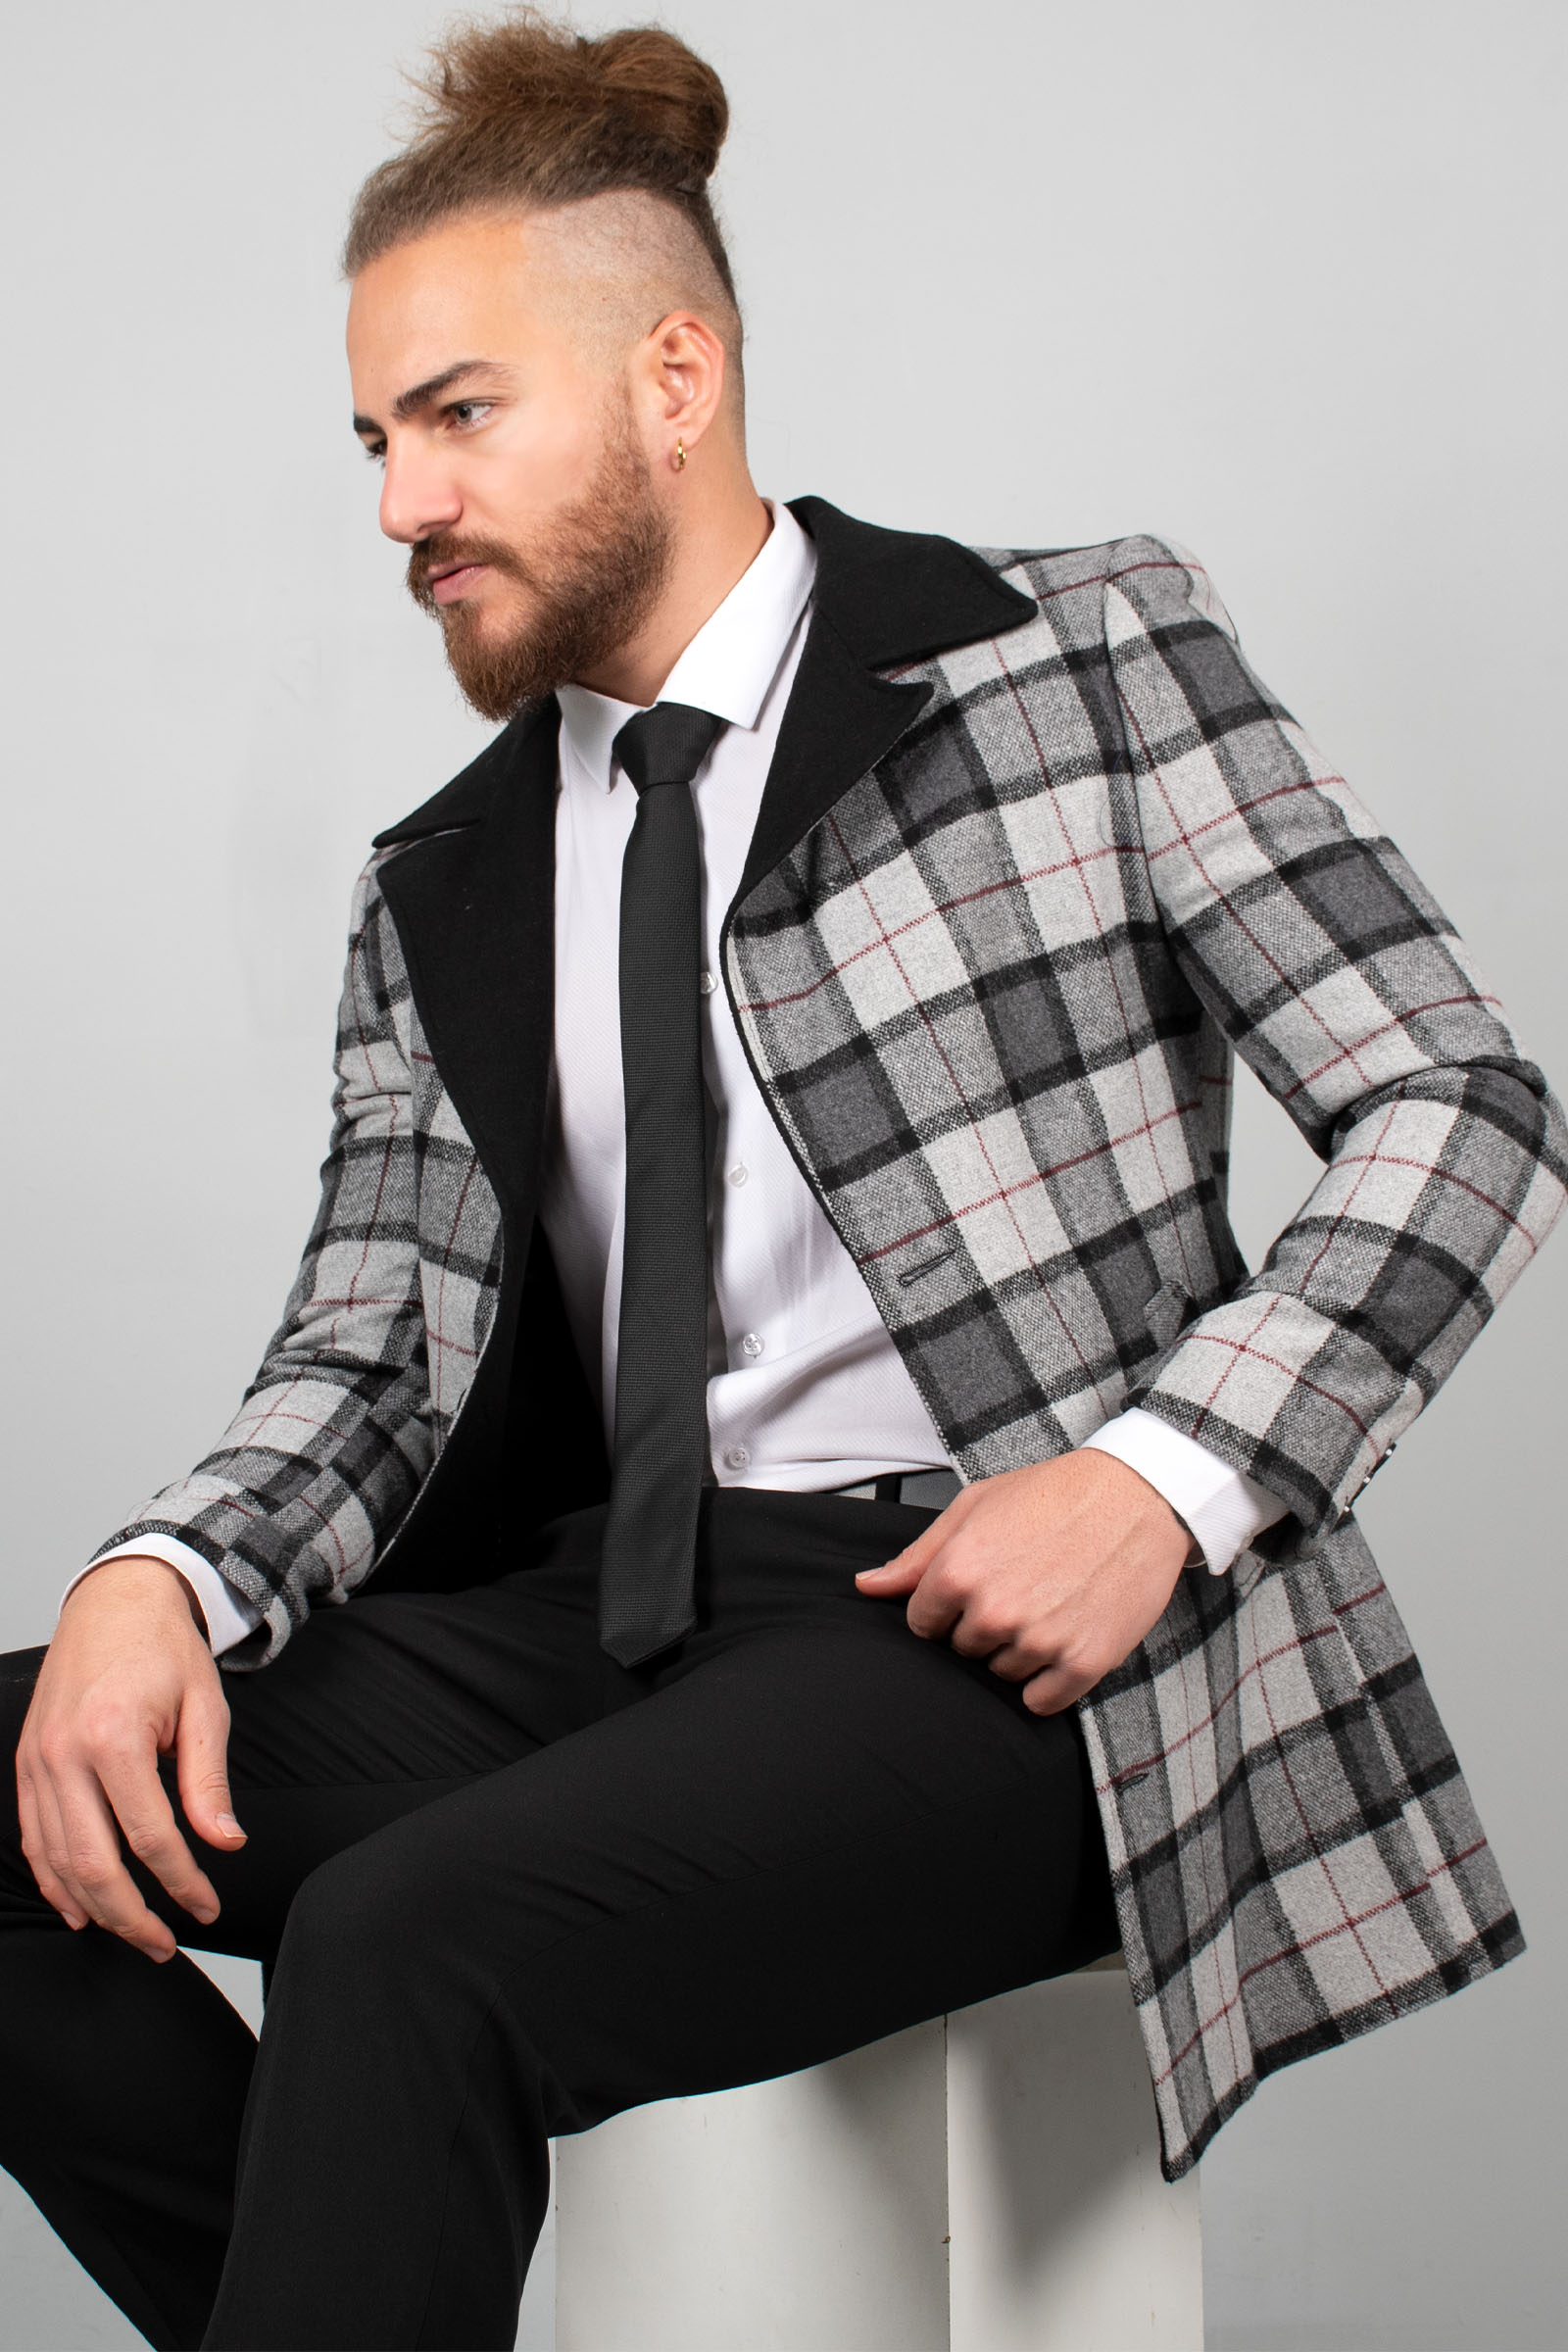 Deepsea cinza masculino de luxo esportes selo casaco casaco quadrado padrão apertado molde quente casual outono inverno estilo italiano longo casaco 1901857